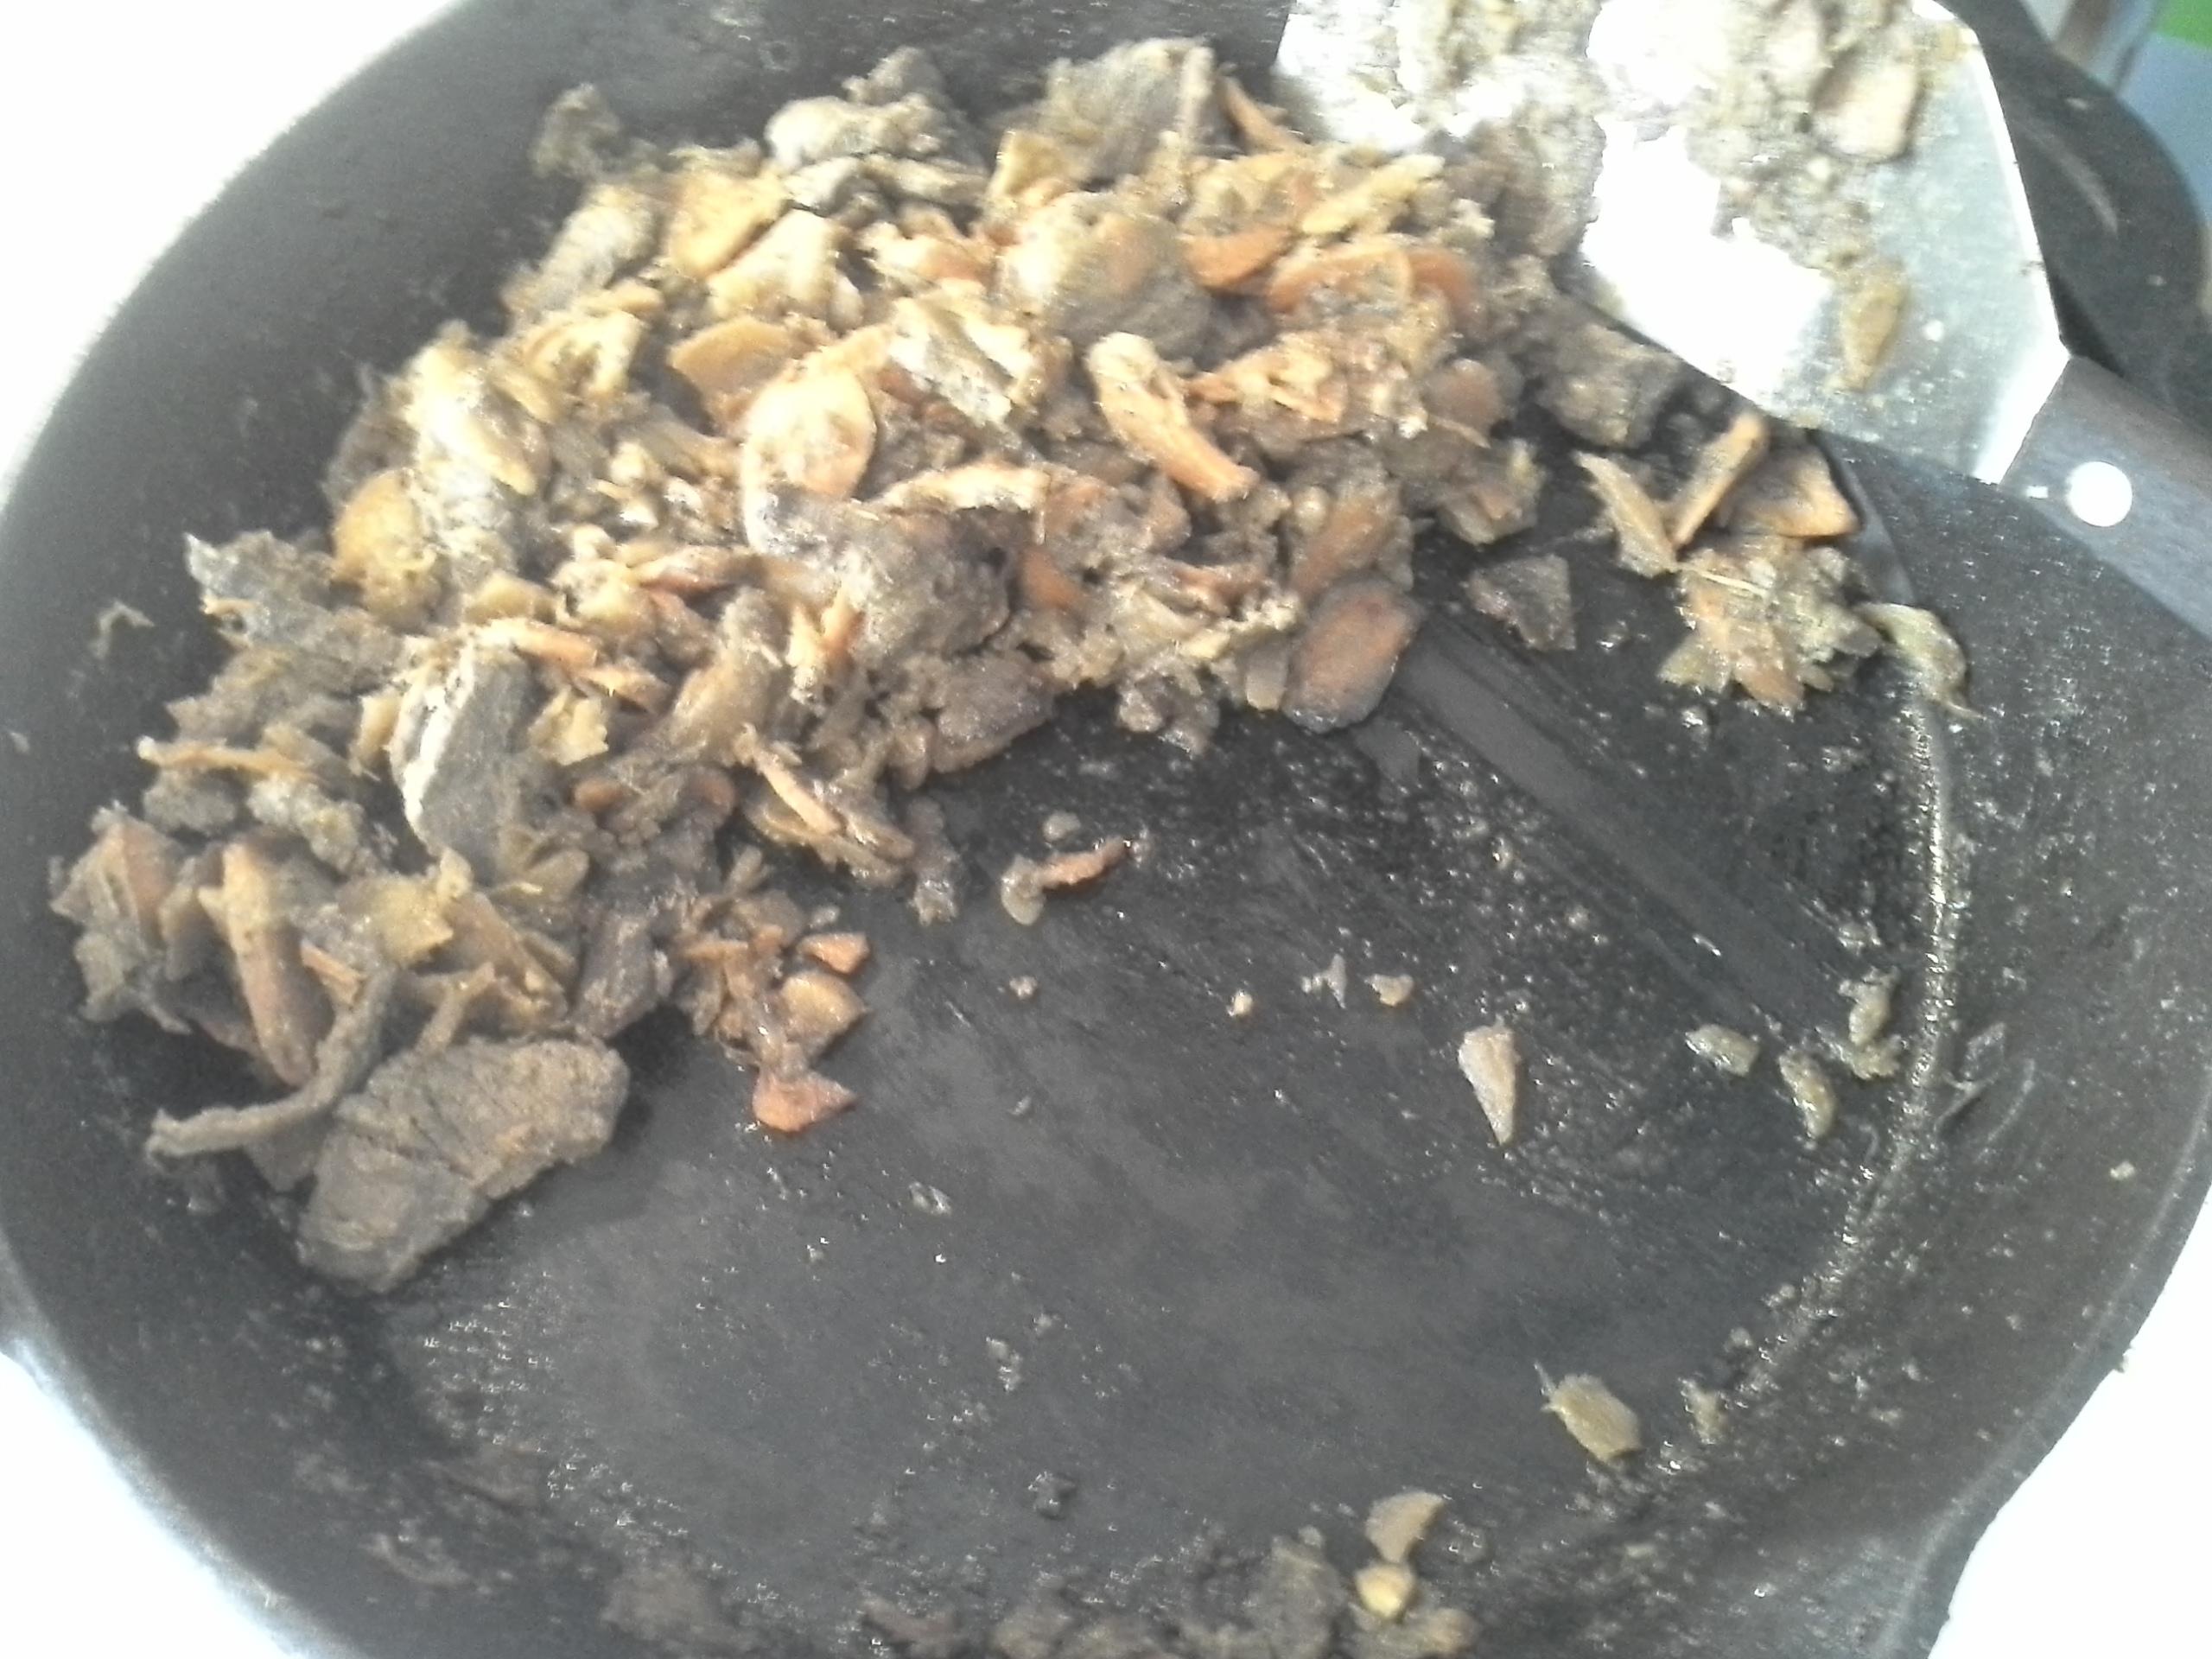 Breakfast: 10:45 a.m.   8 oz. bison, 1 carrot, 1/2 rutabaga, 1/2 sweet onion, 4 cloves garlic, 2 Tbsp. ghee, herbs & spices